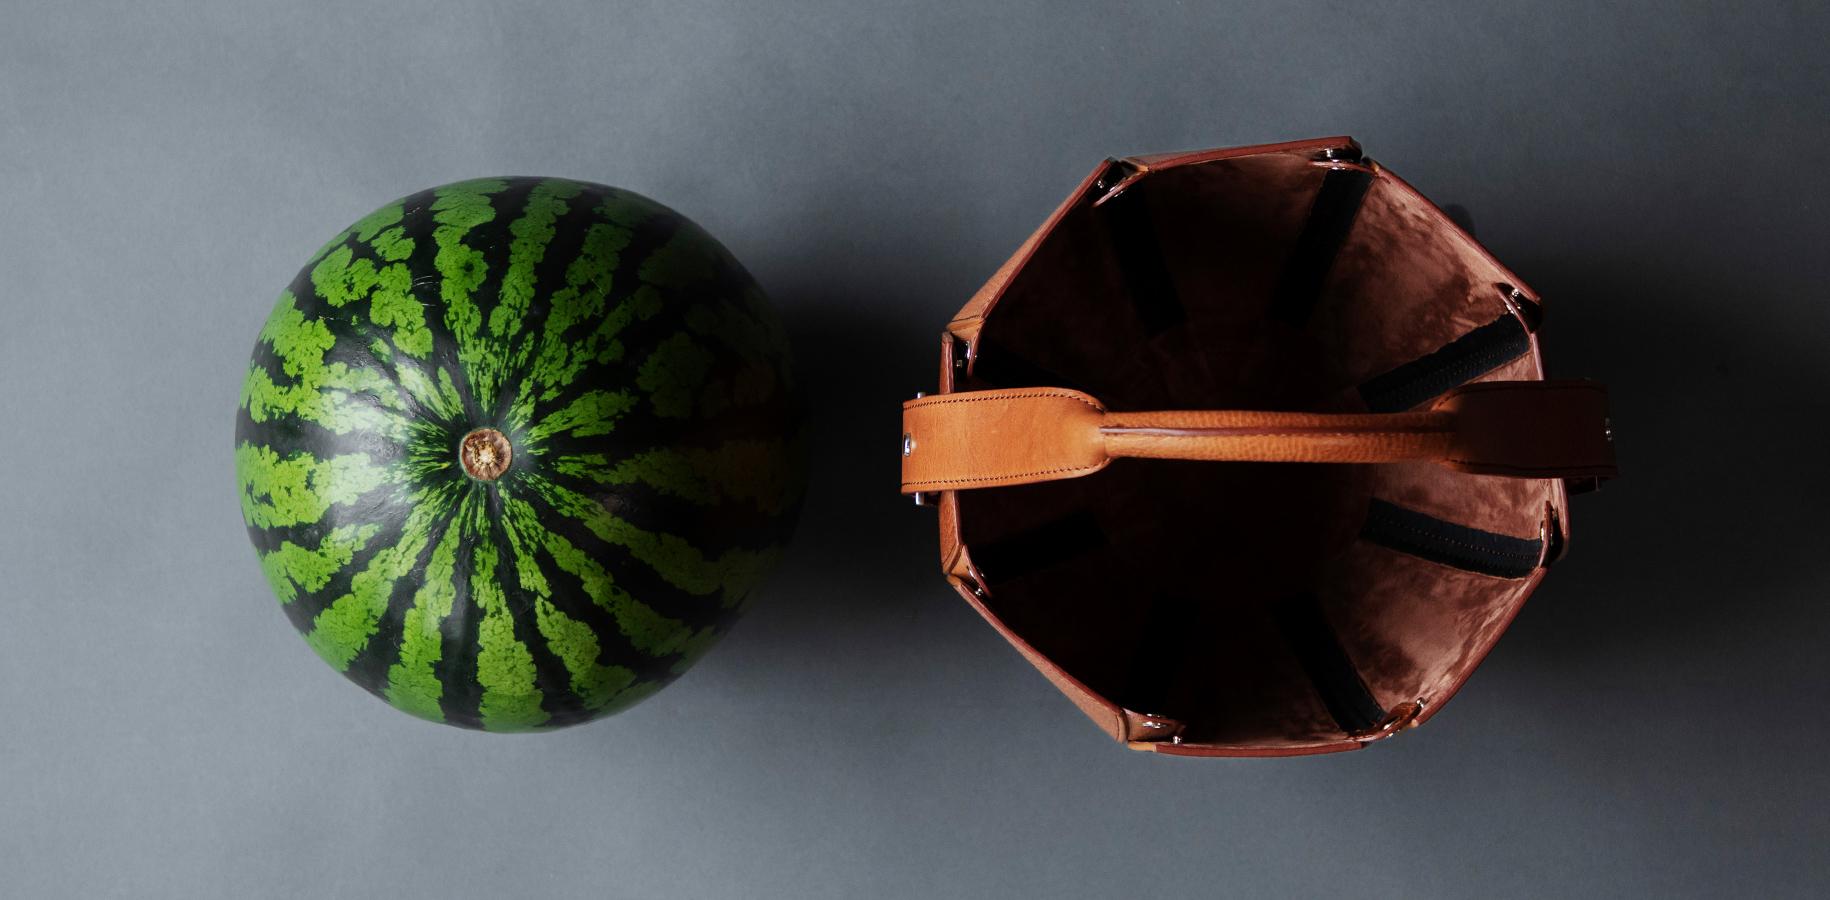 tsuchiya-kaban-2 watermelon tote